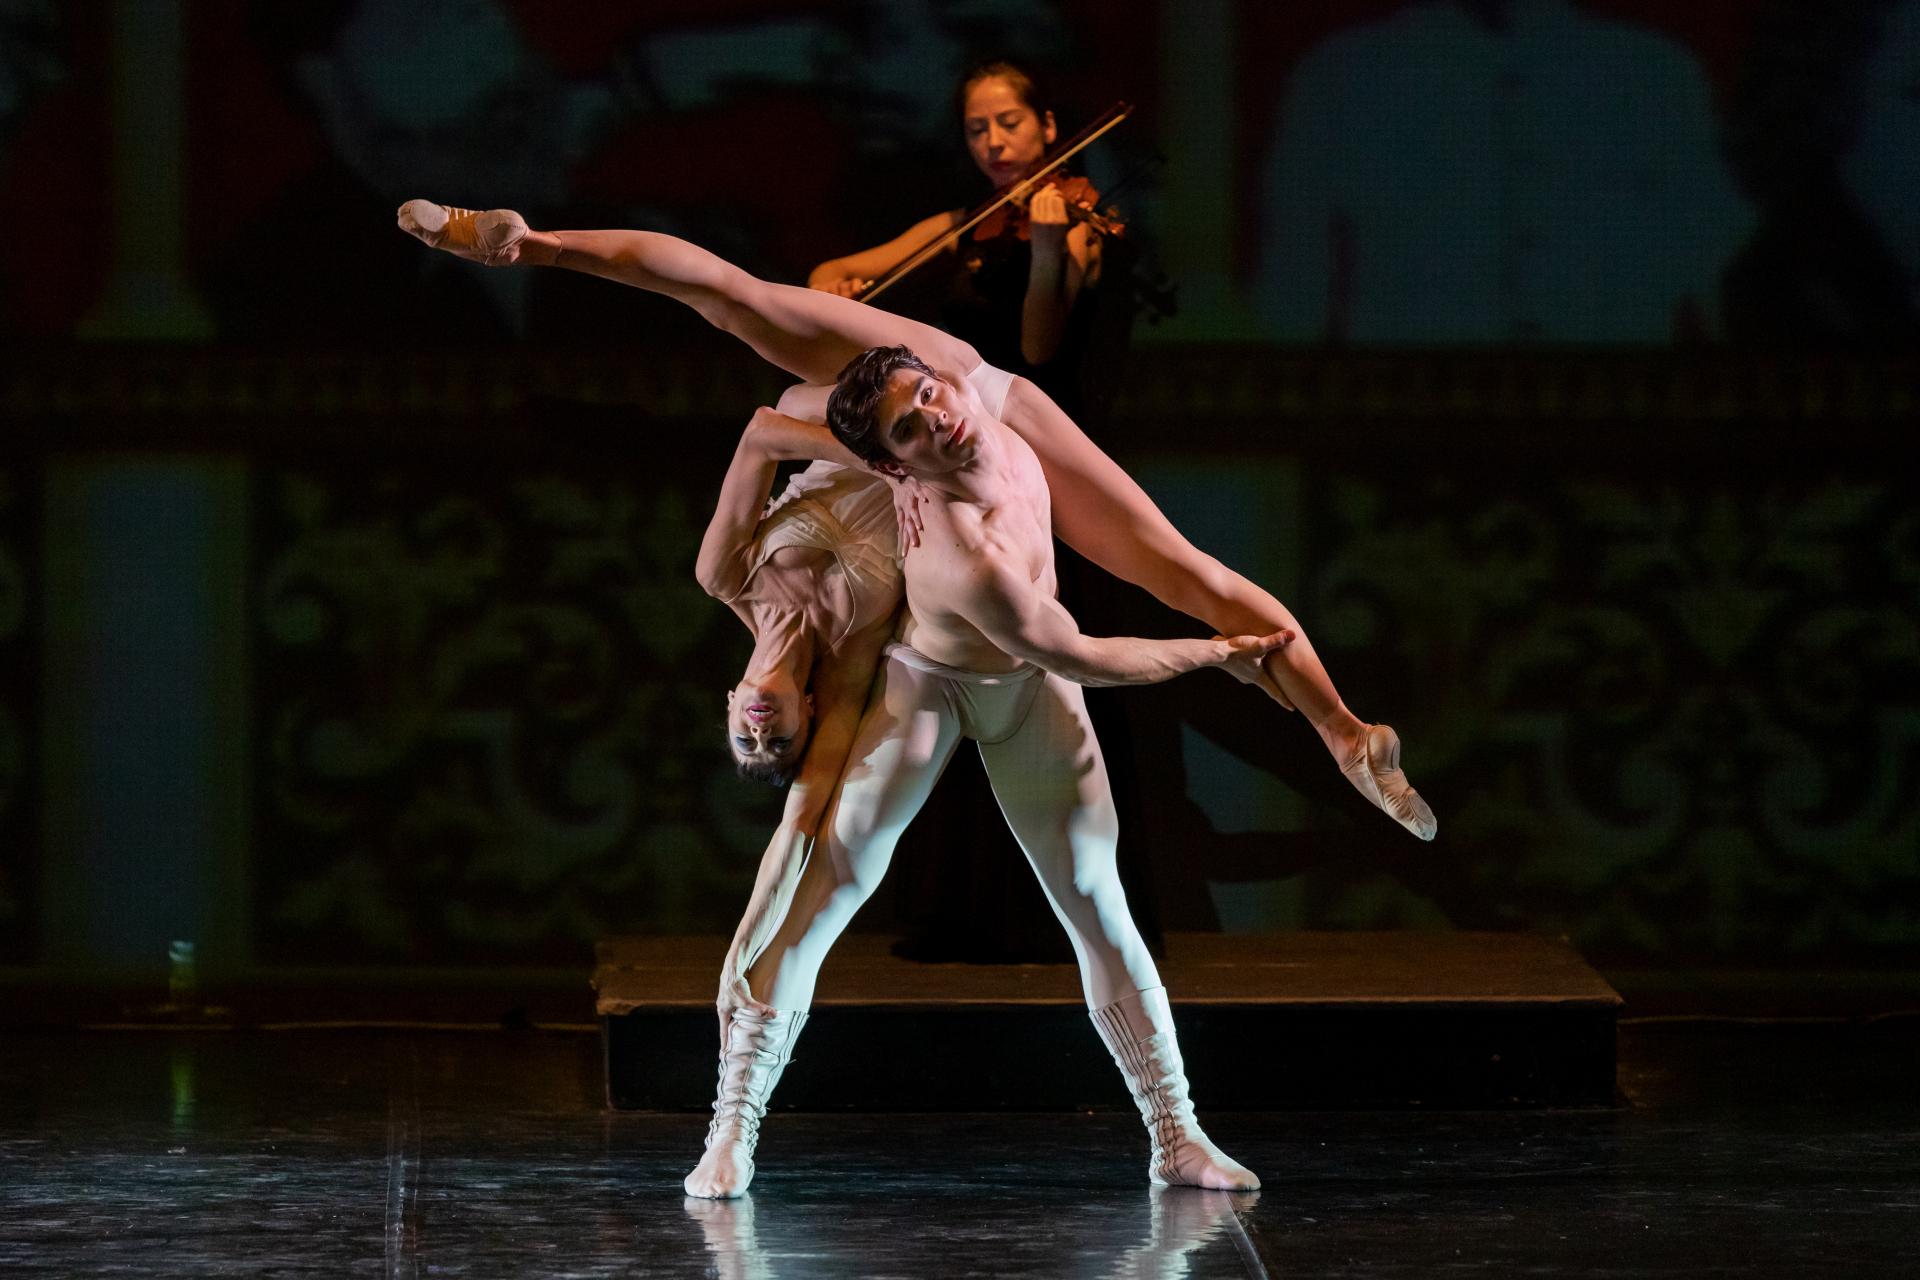 2018_04_18-Opera-Danza-Festival-©-Luca-Vantusso-195430-5D4B1944